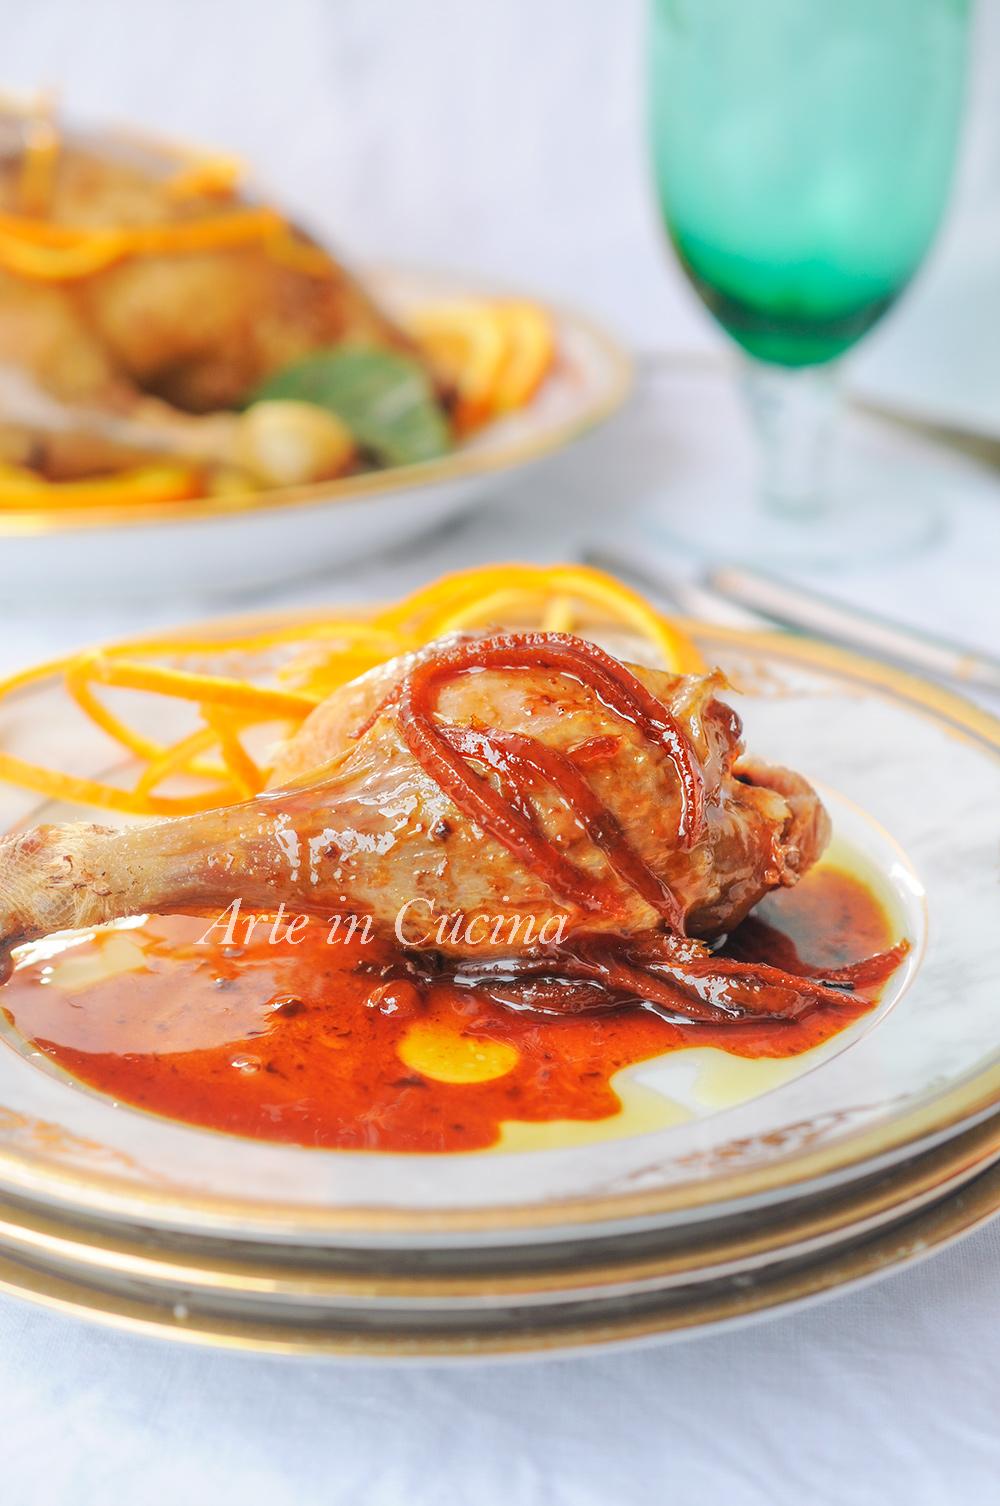 Anatra all'arancia ricetta francese facile e gustosa vickyart arte in cucina